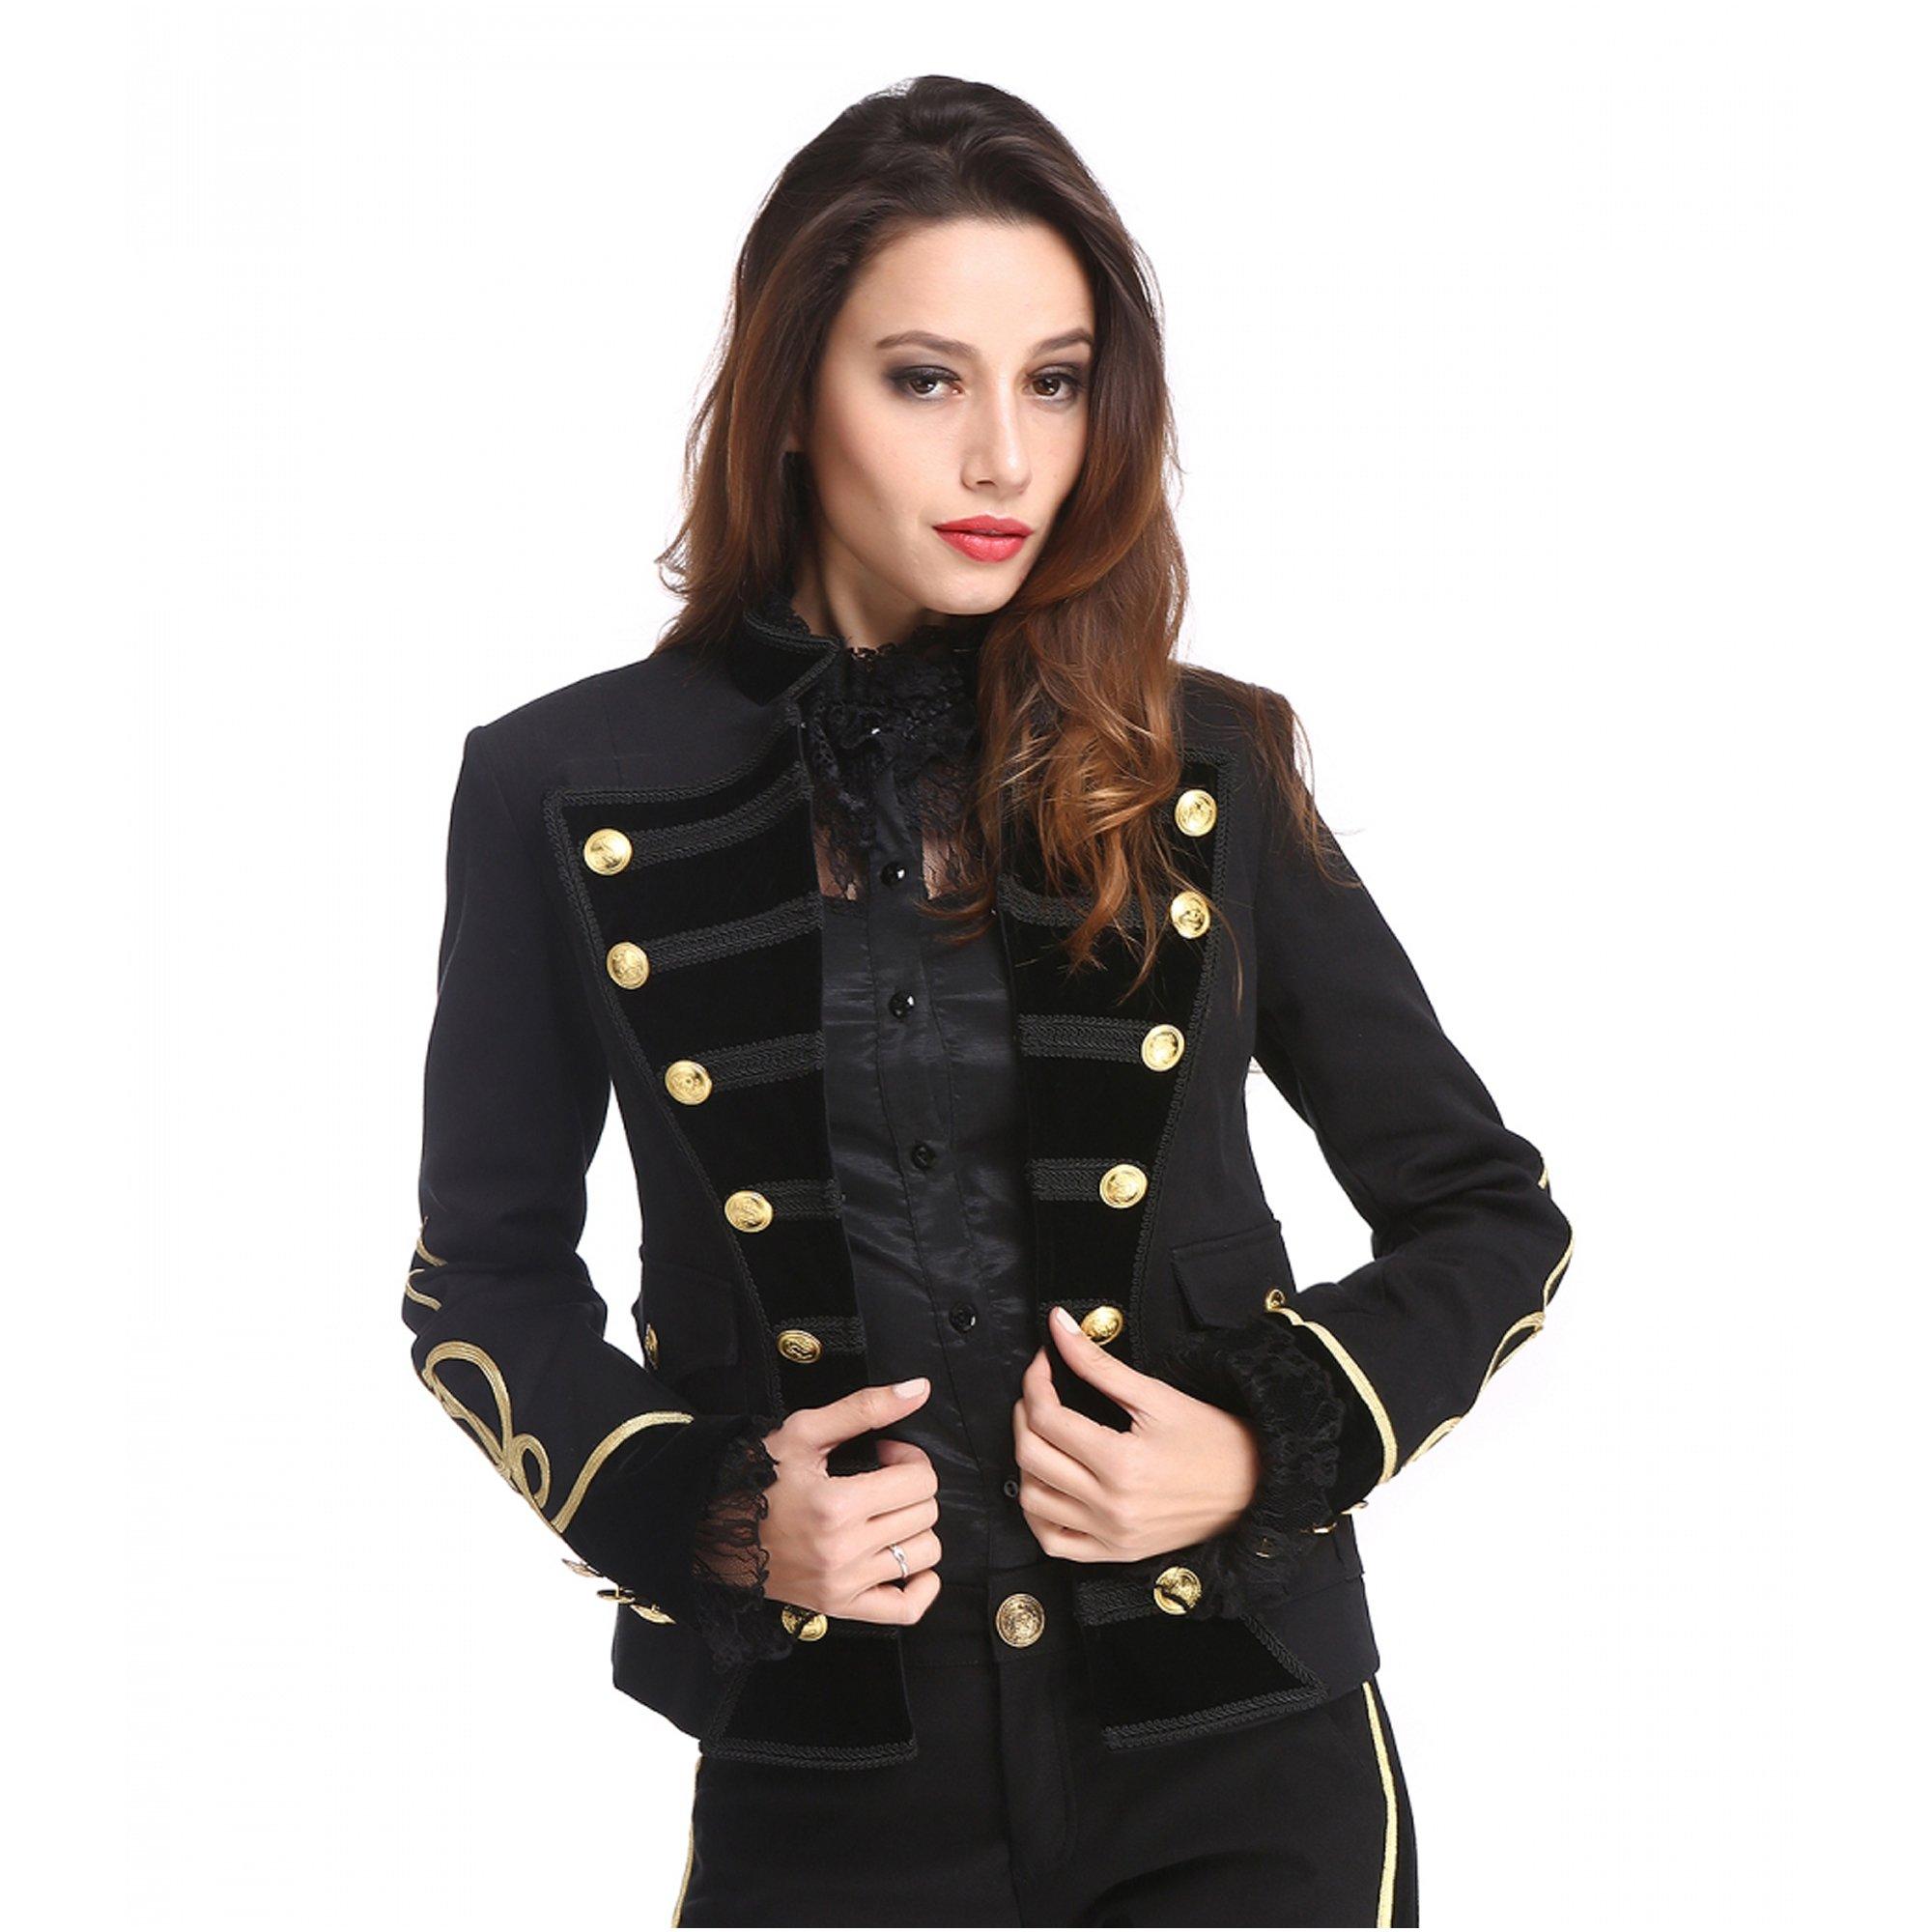 Military Jacke Damen extravagantes Modell viele Knöpfe